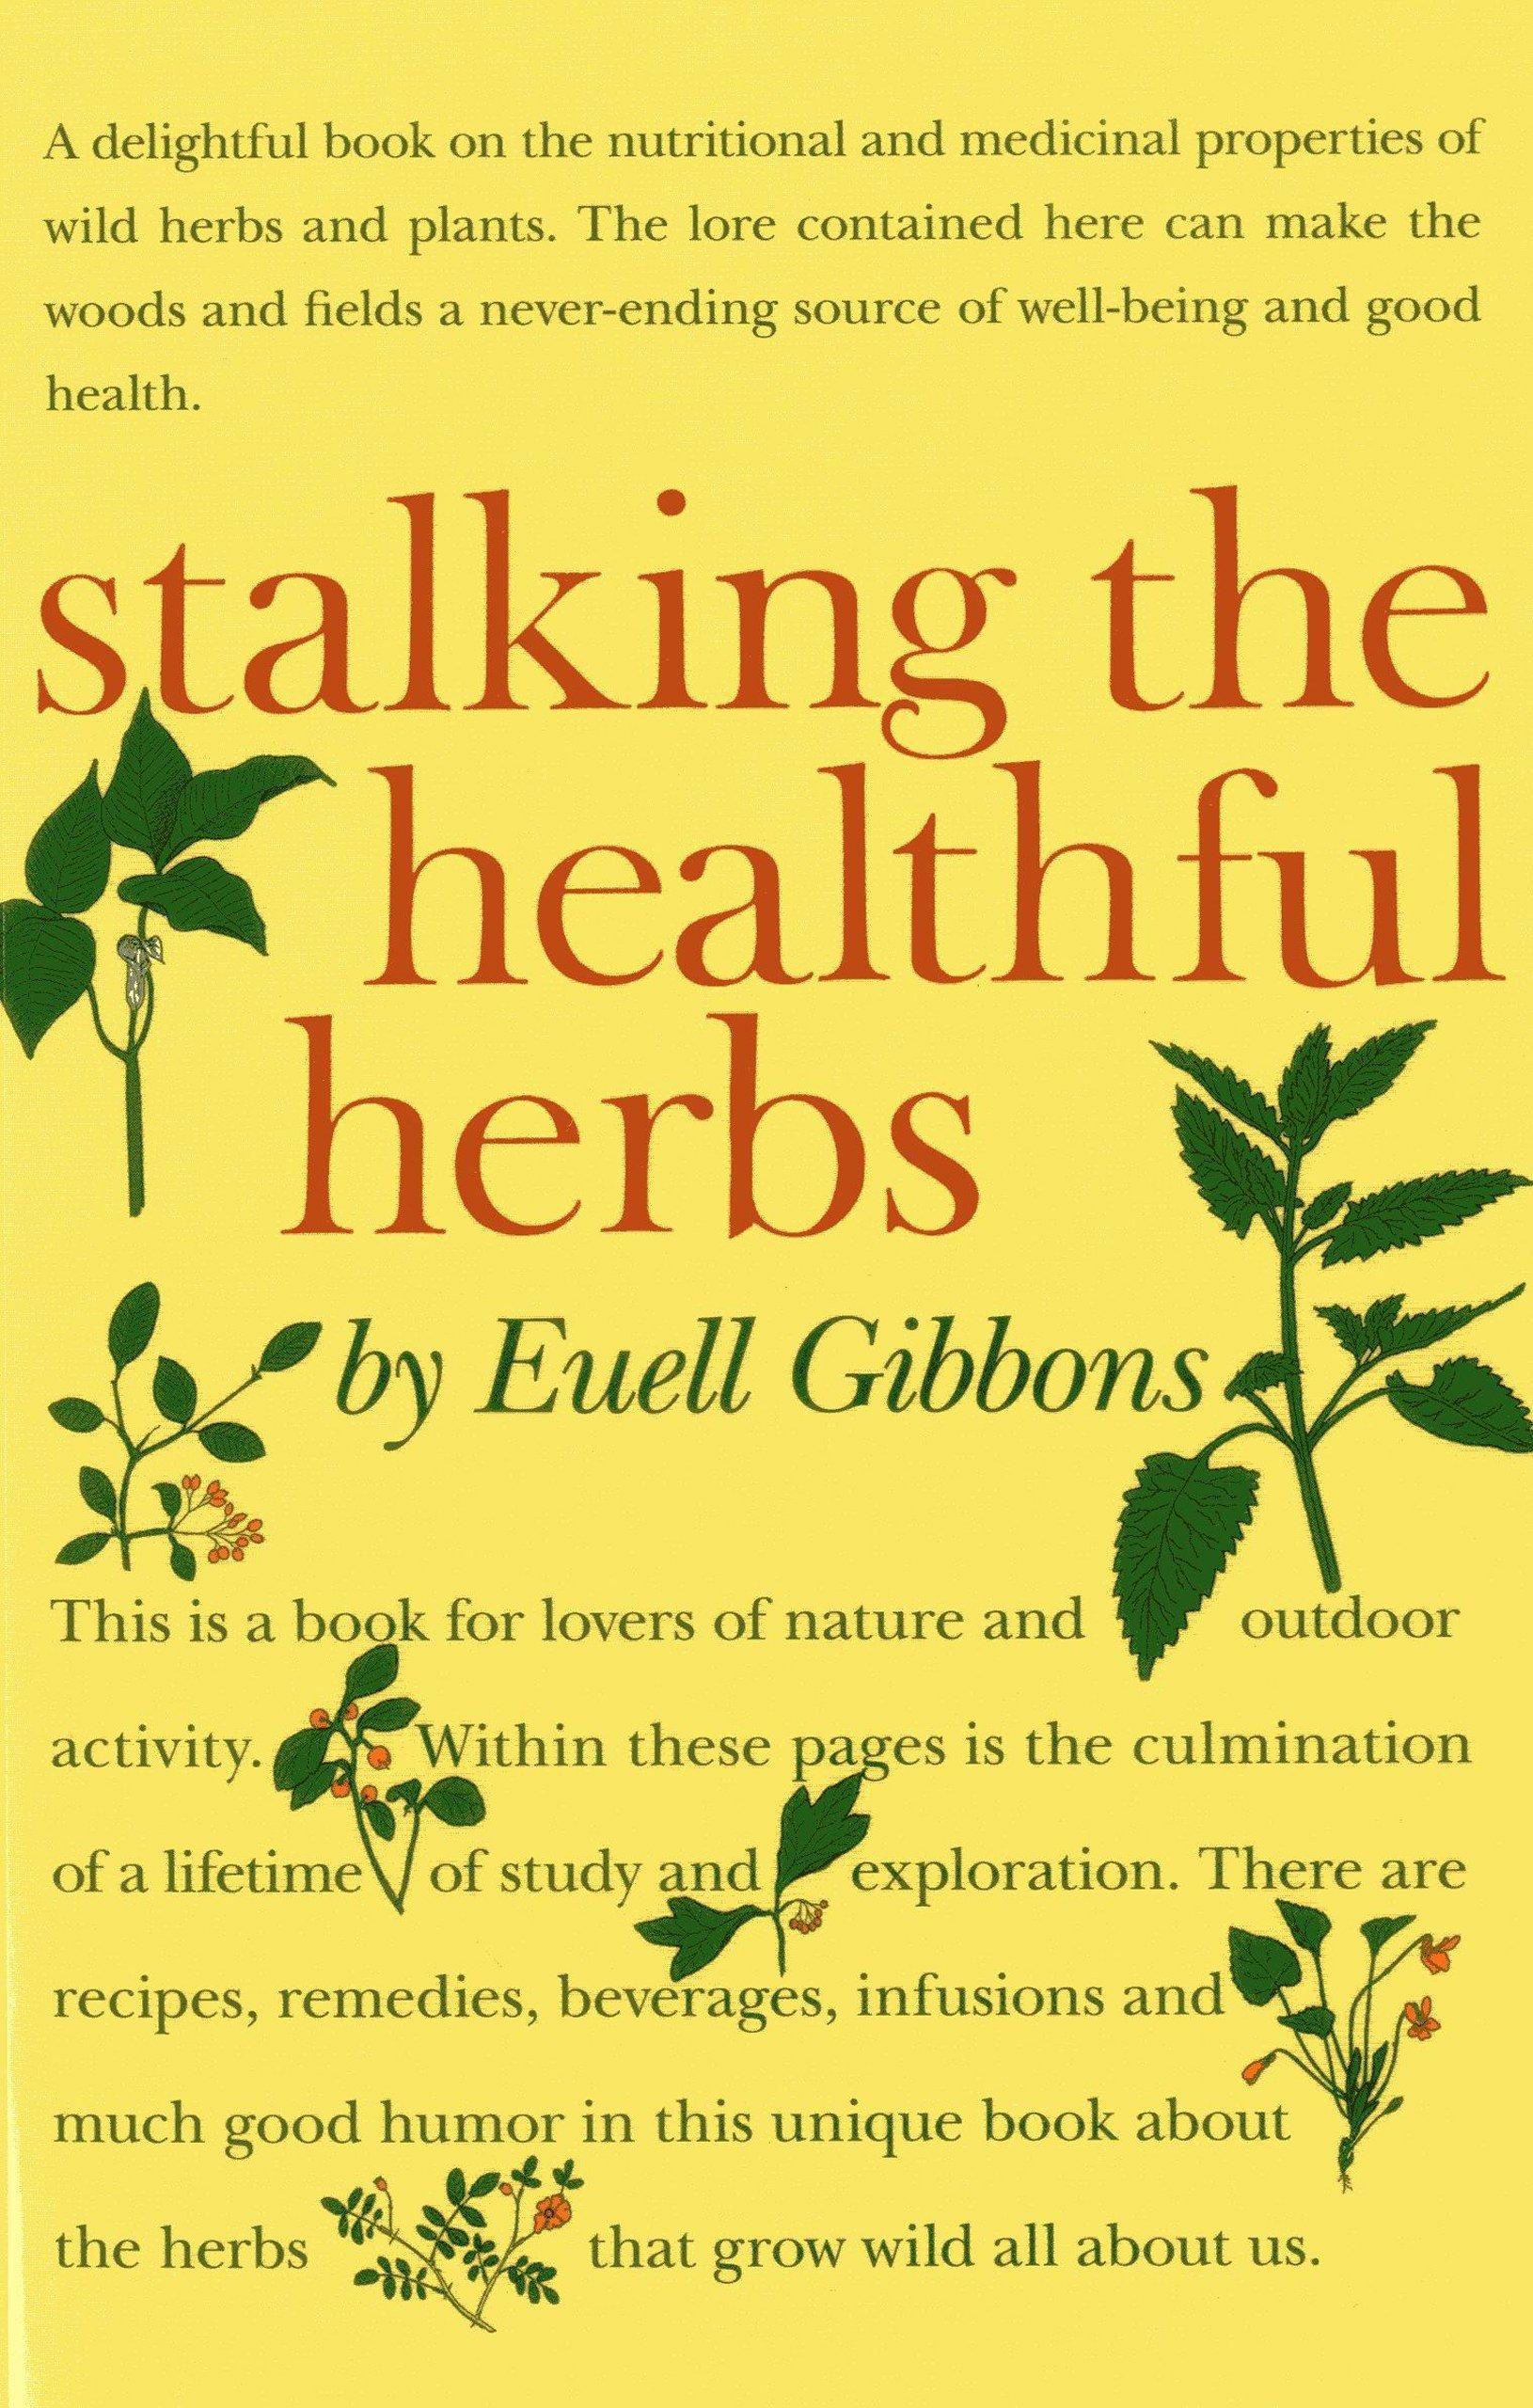 Stalking The Healthful Herbs (19660101)